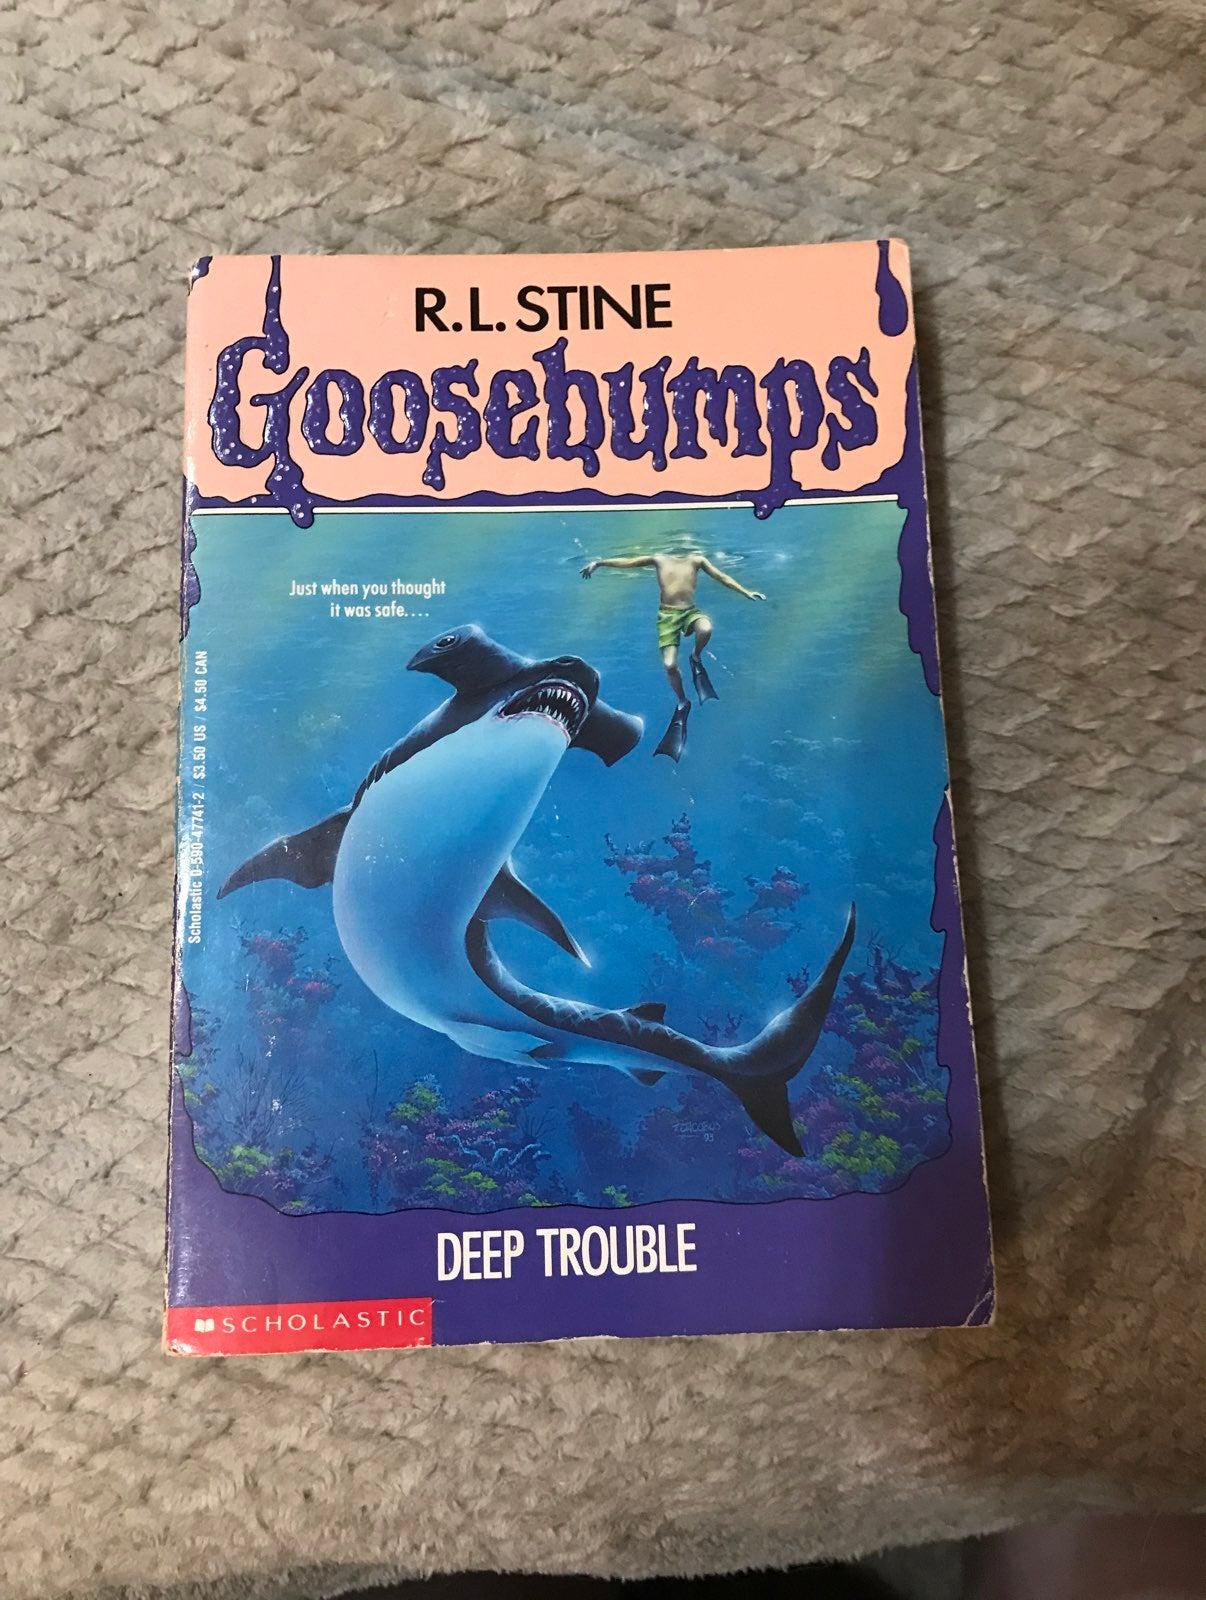 Goosebumps Deep Trouble #19 Book